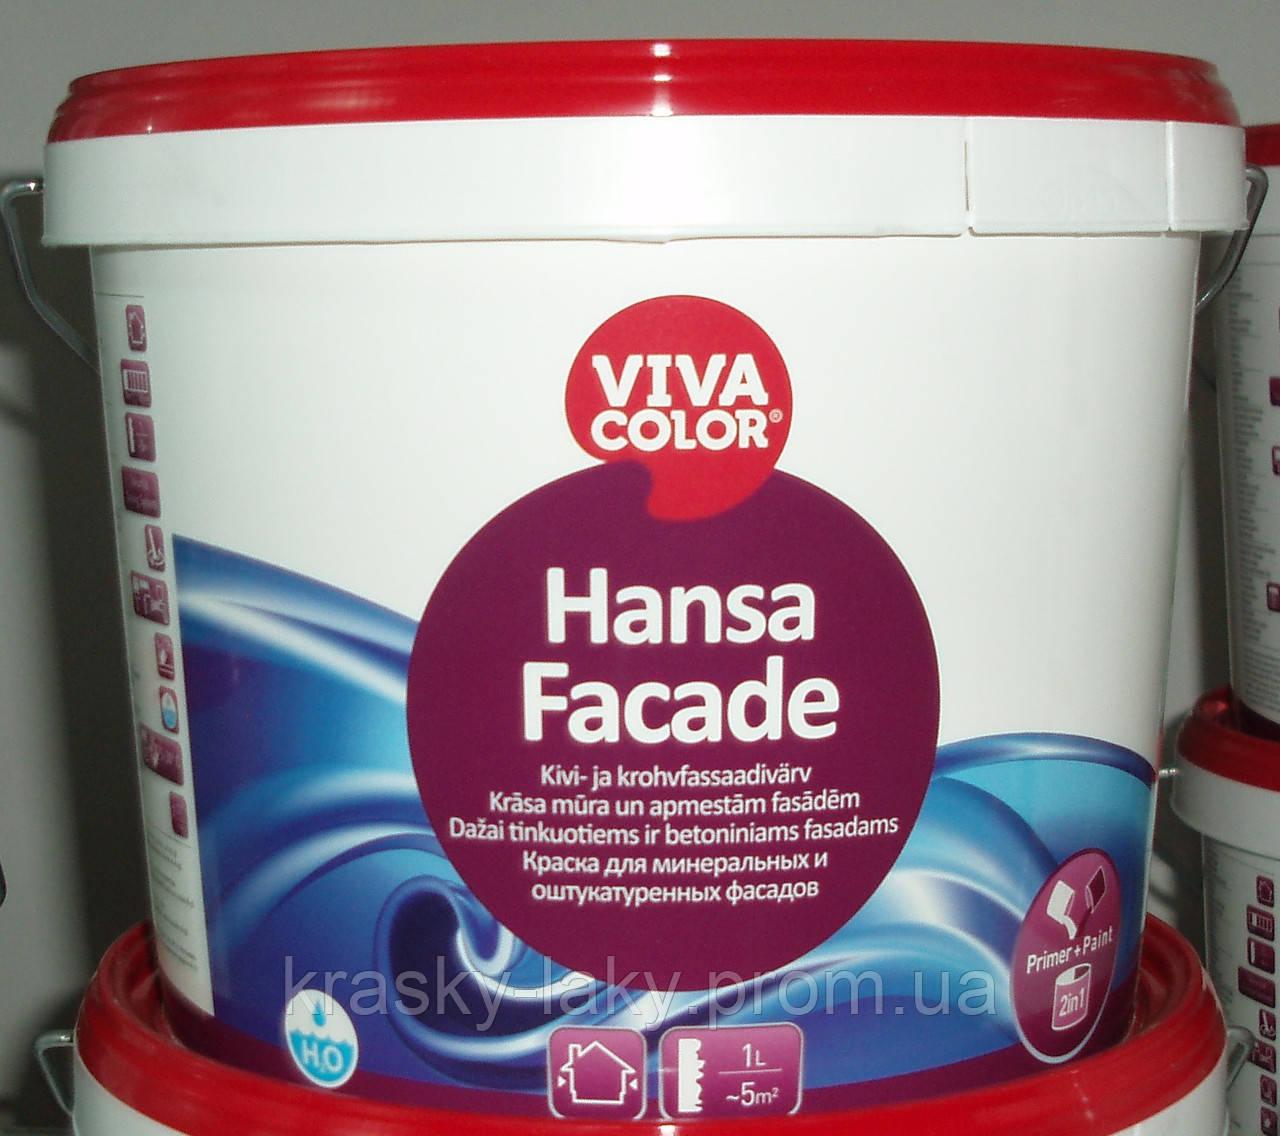 Краска фасадная Hansa Facade VIVACOLOR, 9л.